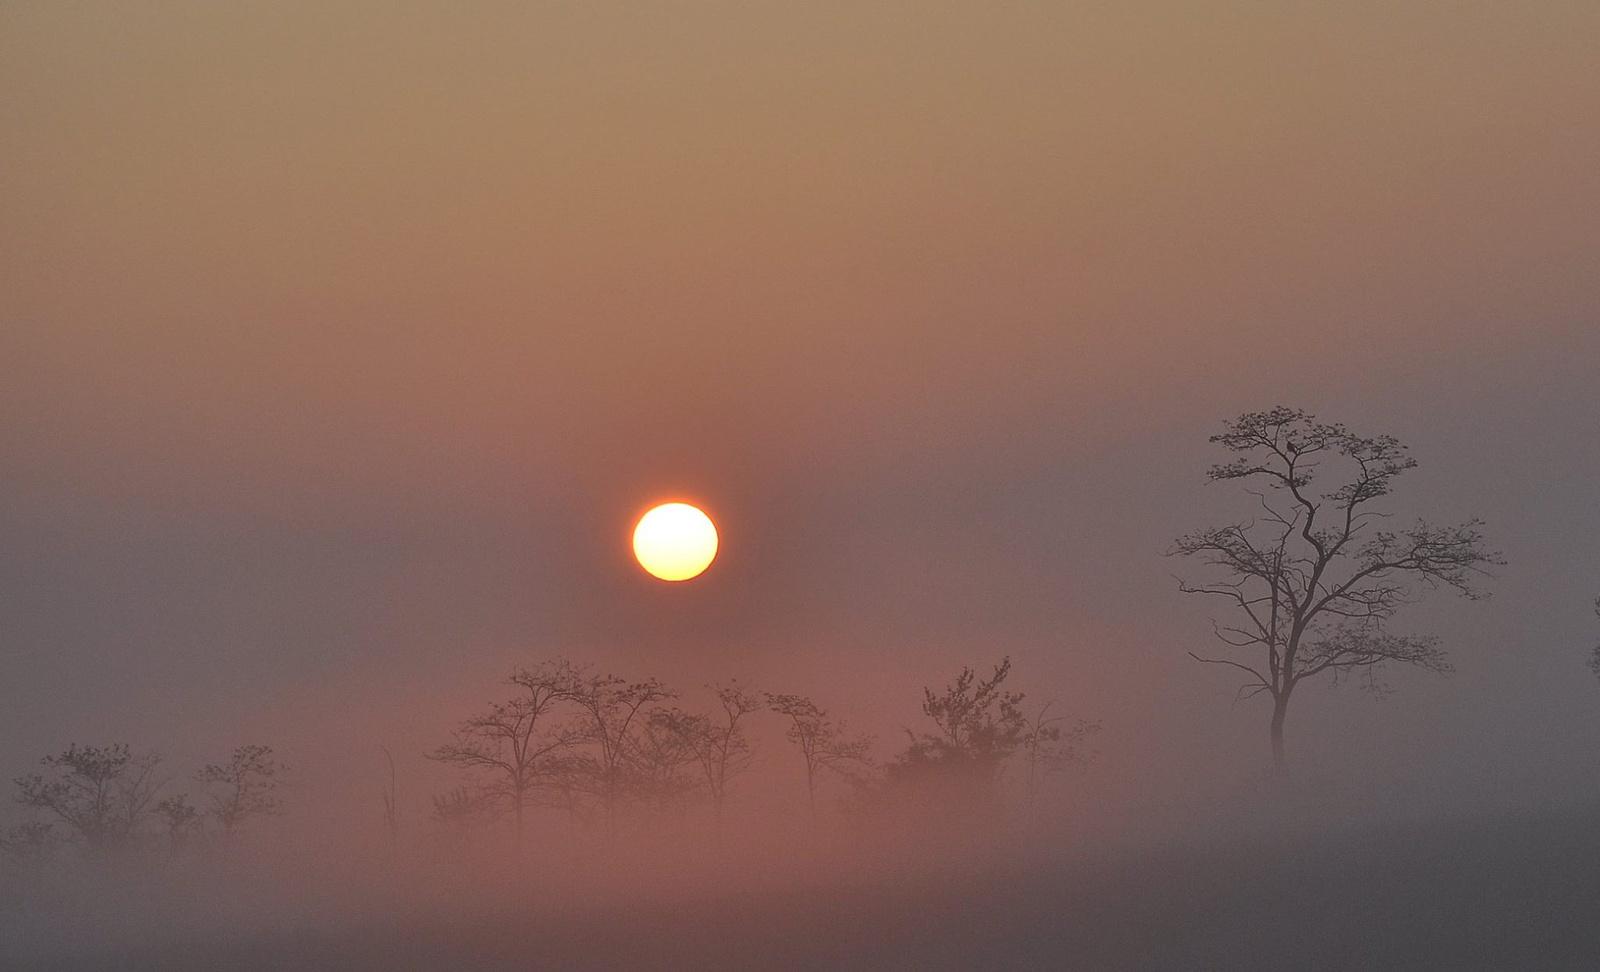 Ködös napkelteBBB